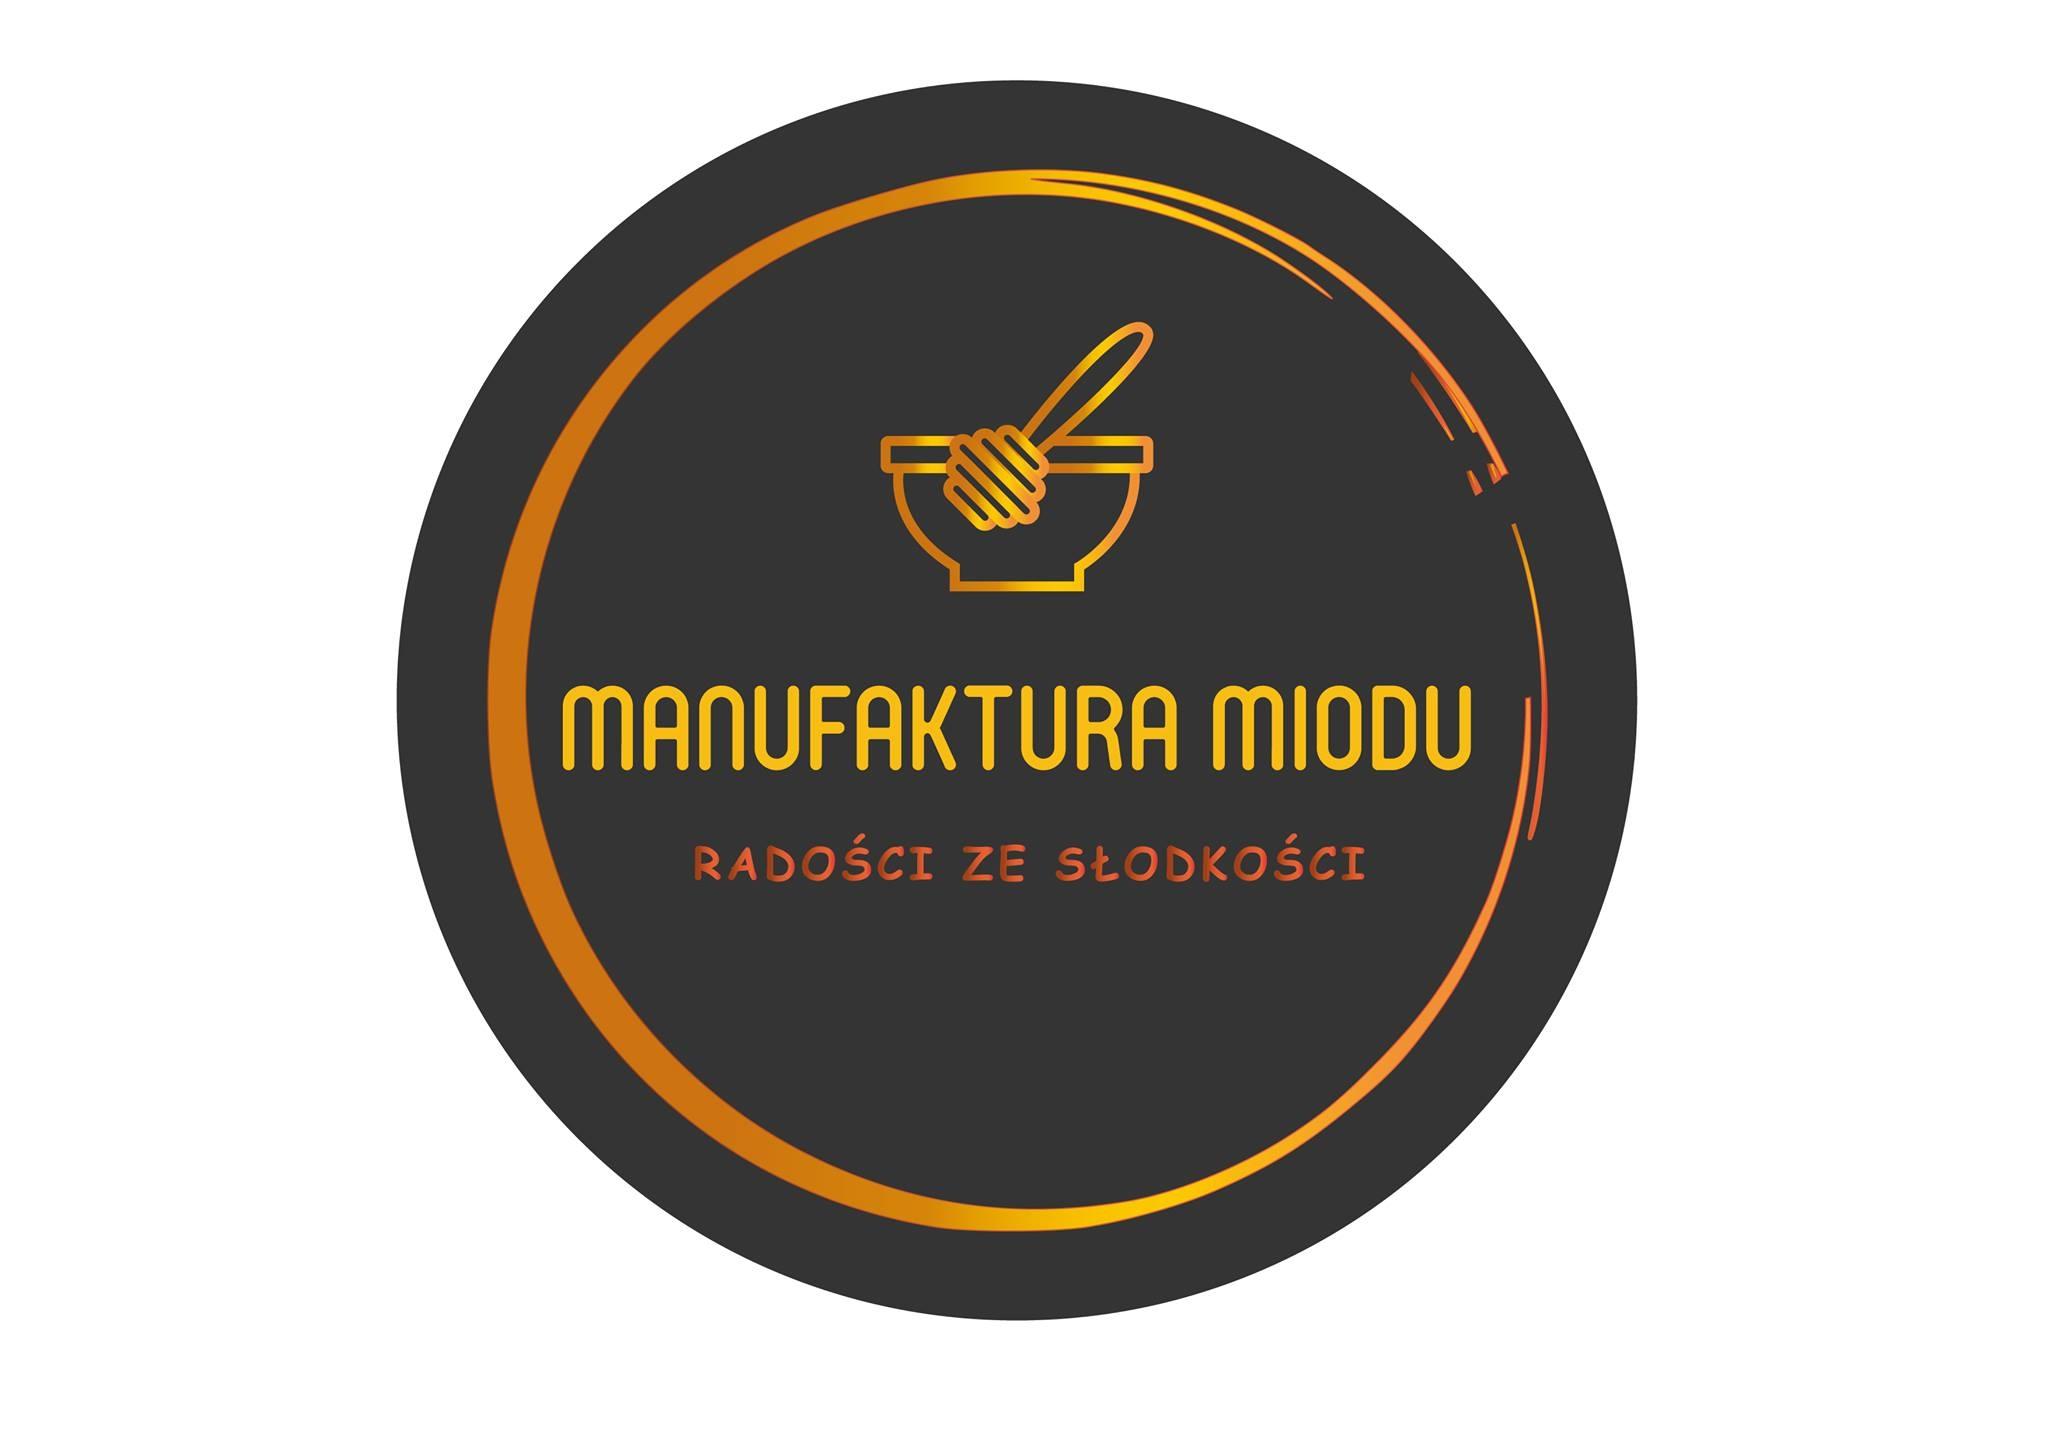 Manufaktura Miodu Wrocław